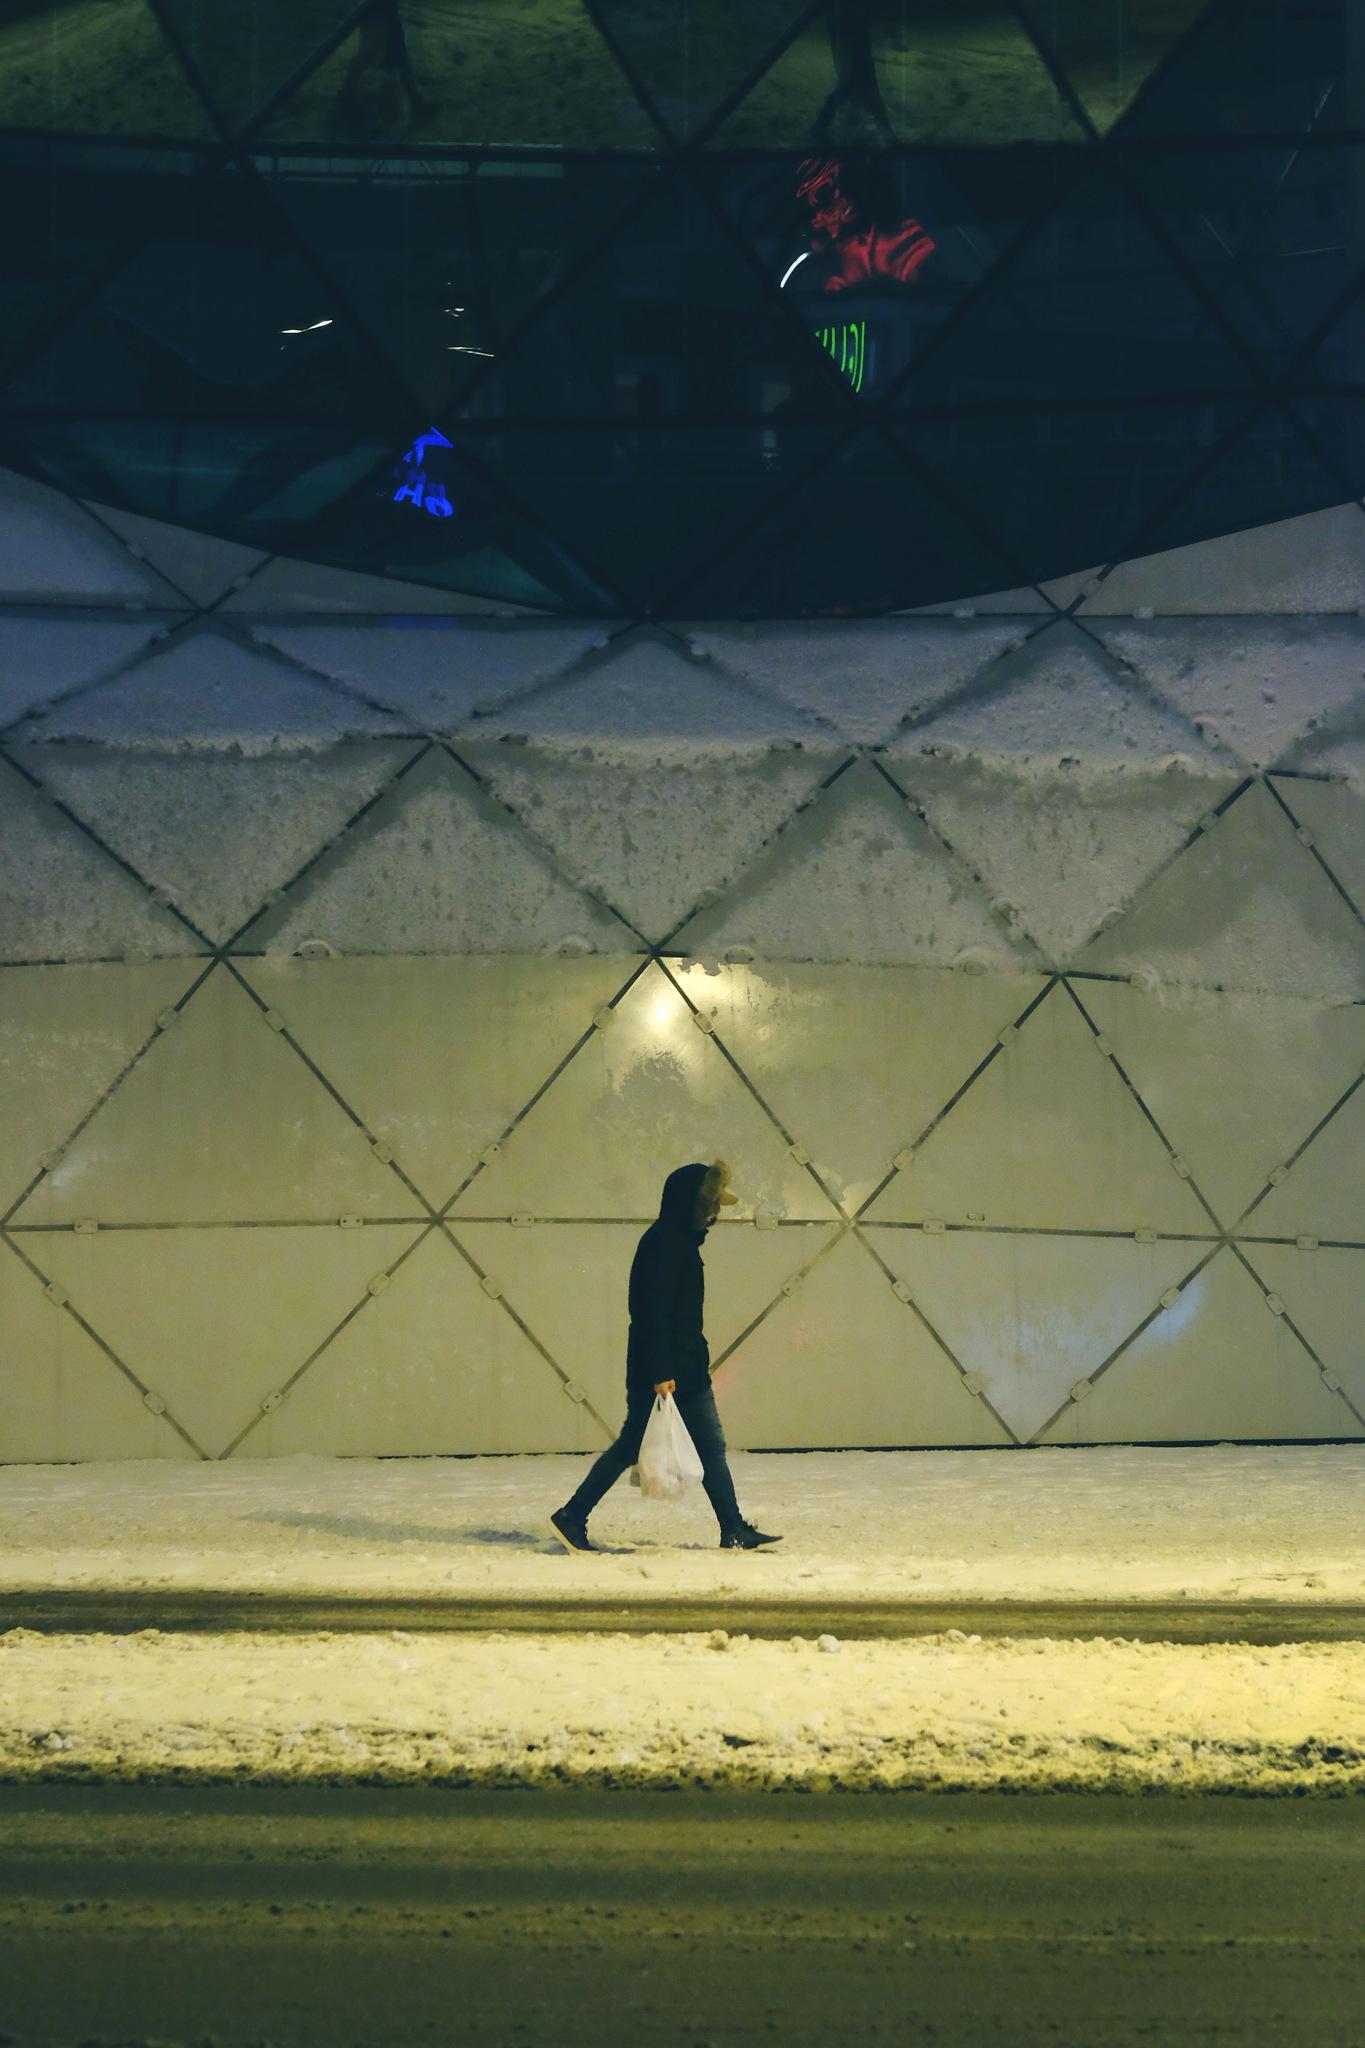 The white walker by Bram Busink